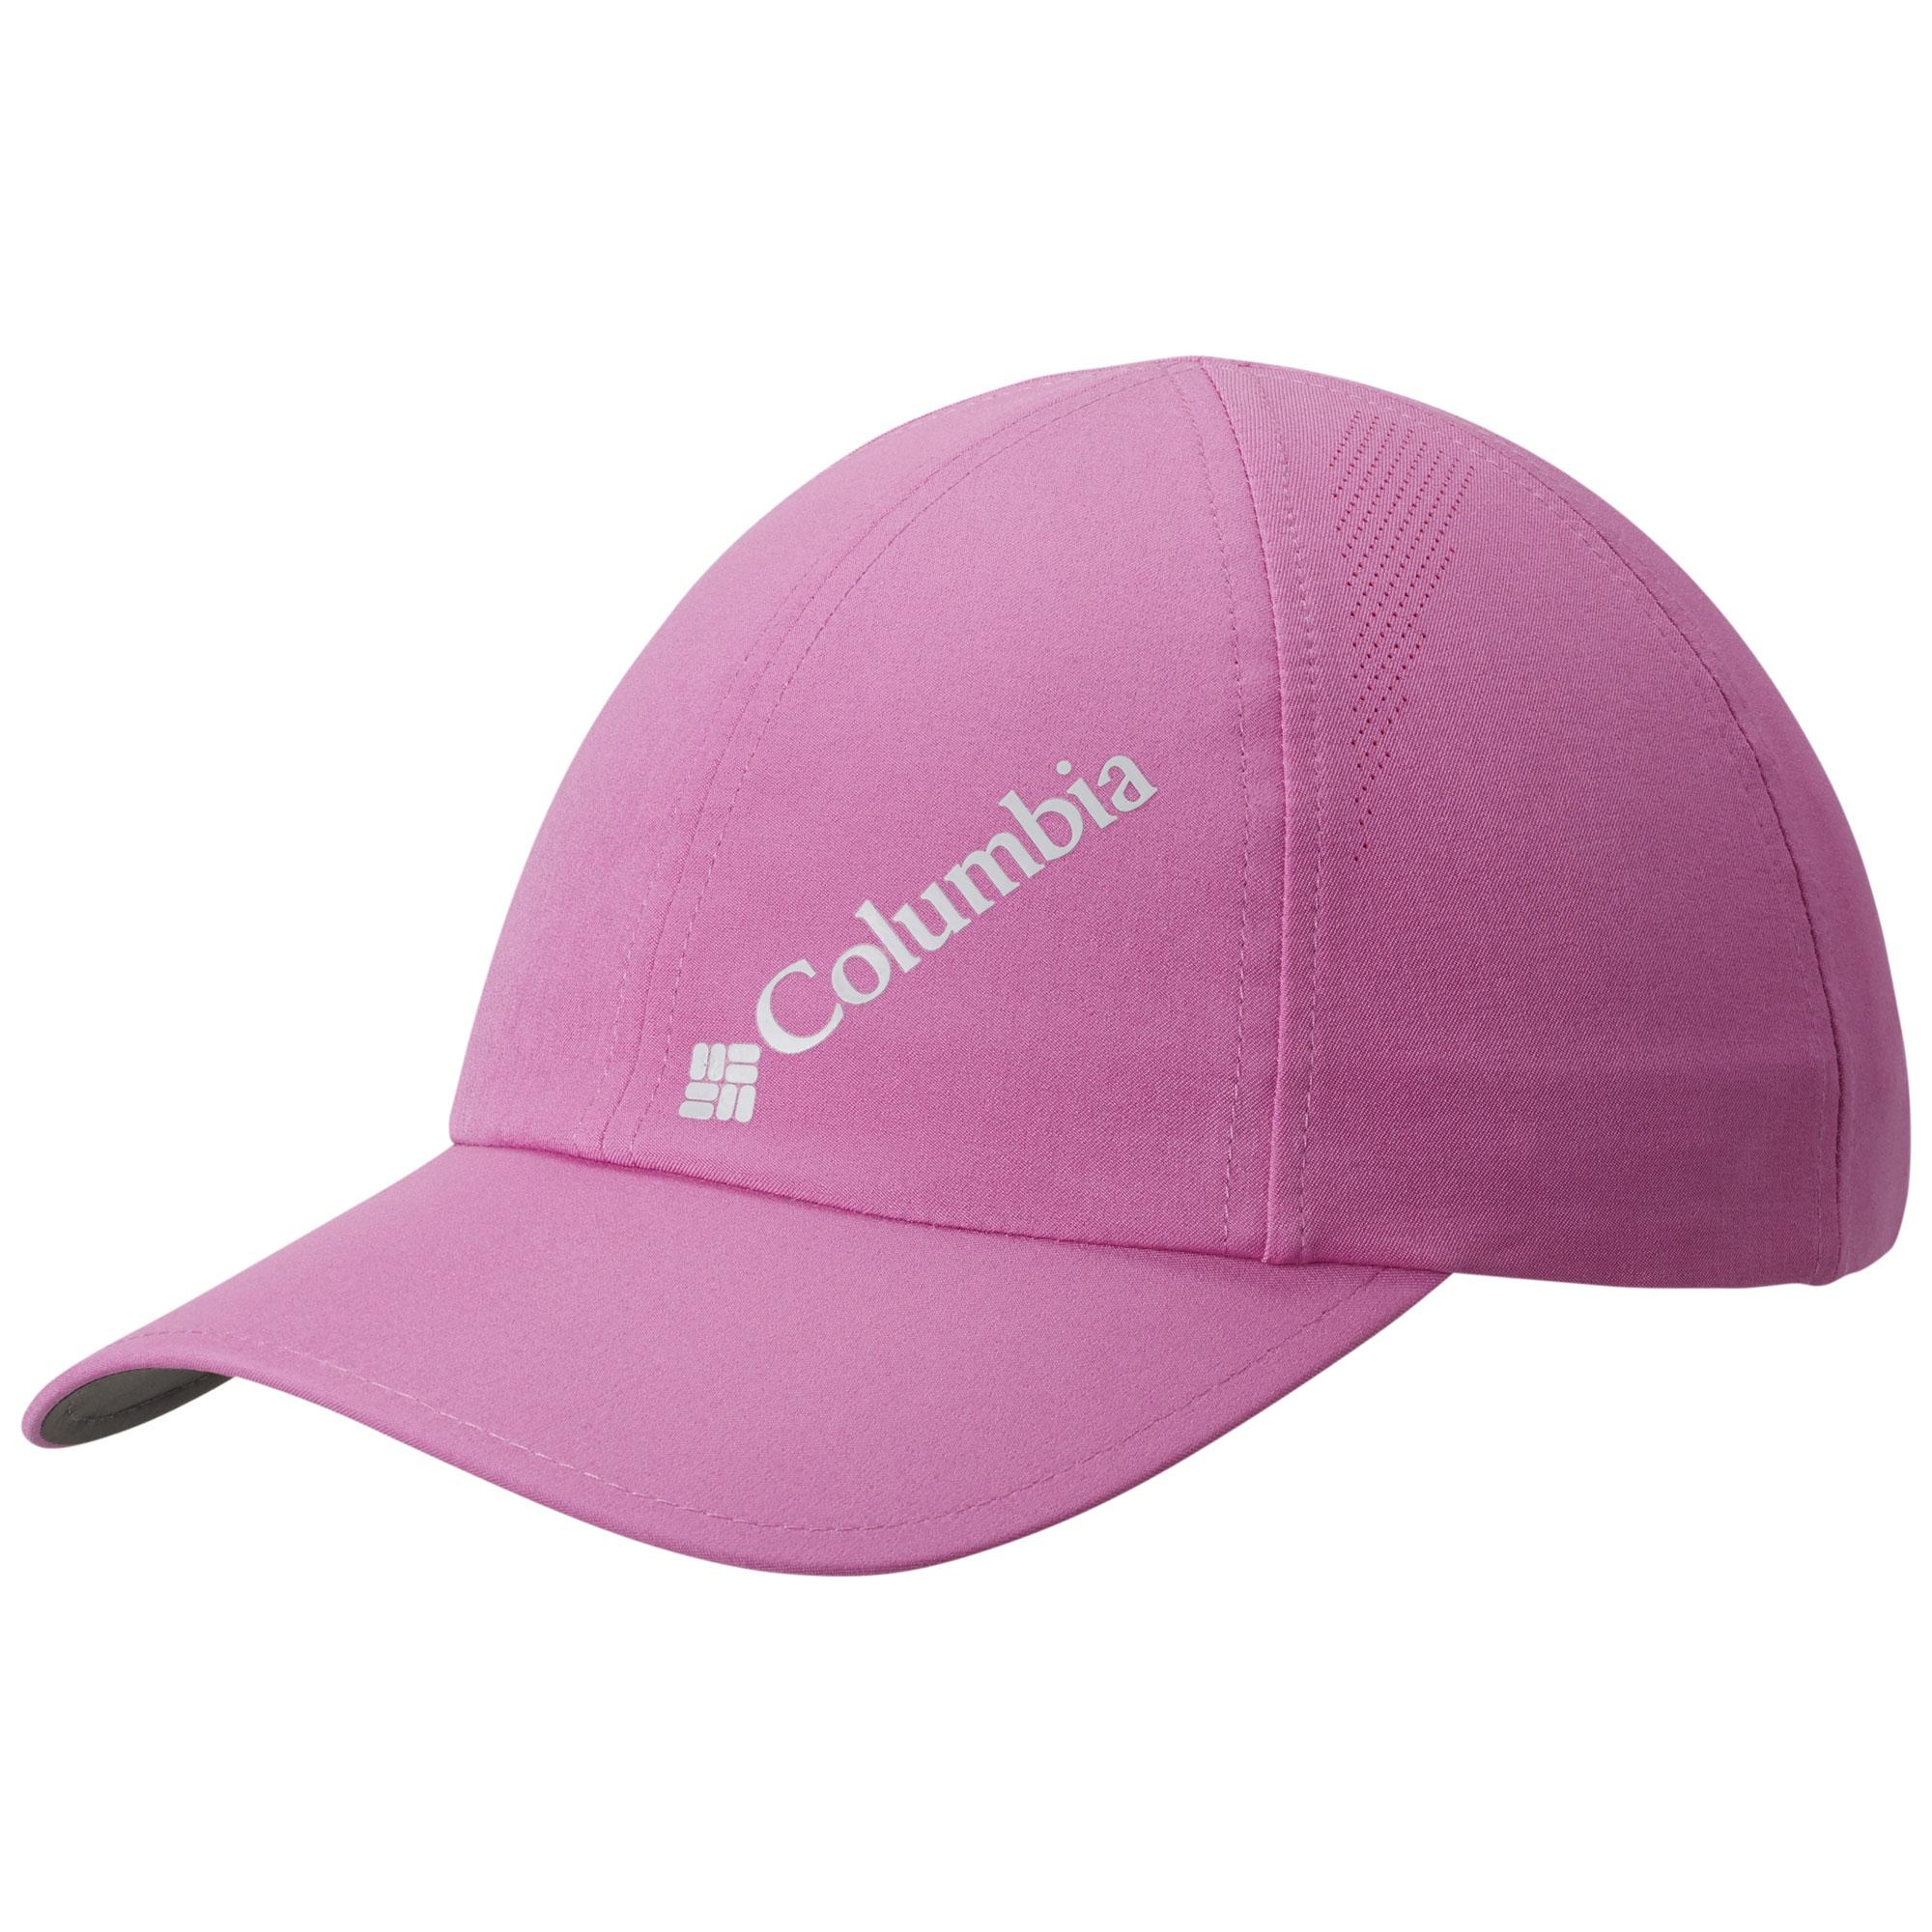 Columbia Damen Kappe Silver Ridge Ball Cap CL9016-547 95c1567a5332